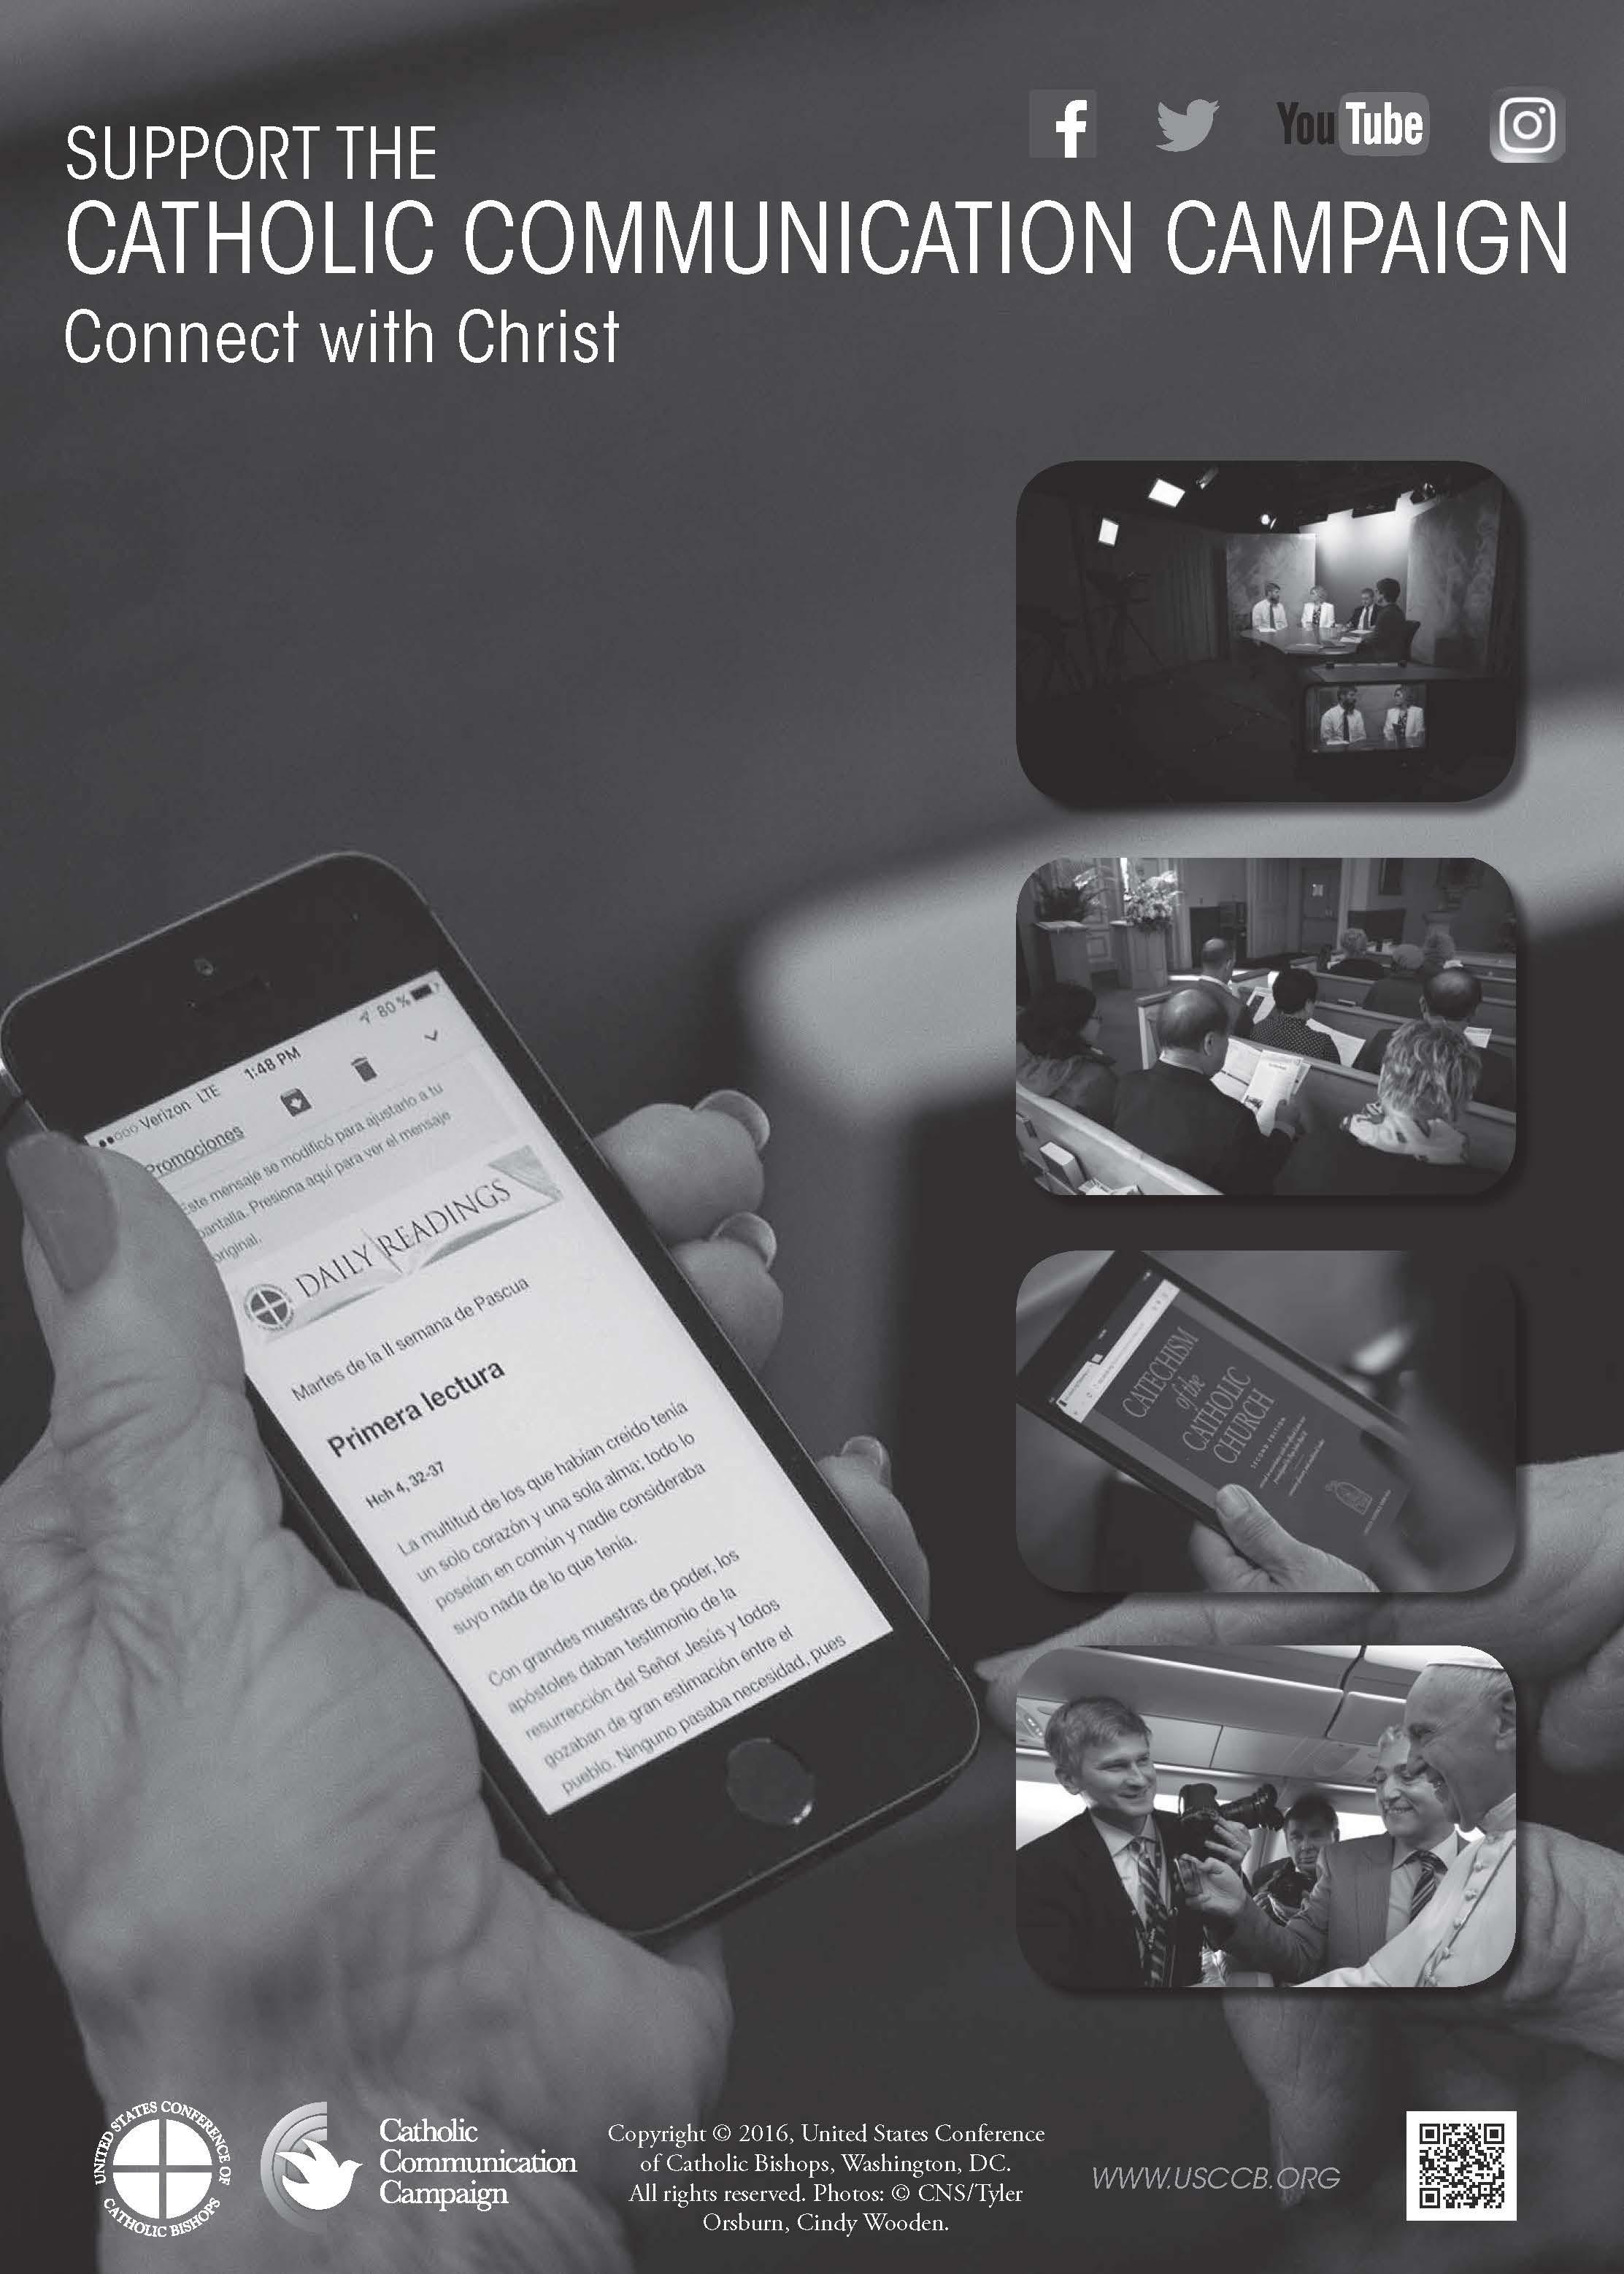 2018 Catholic Communication Campaign Resources